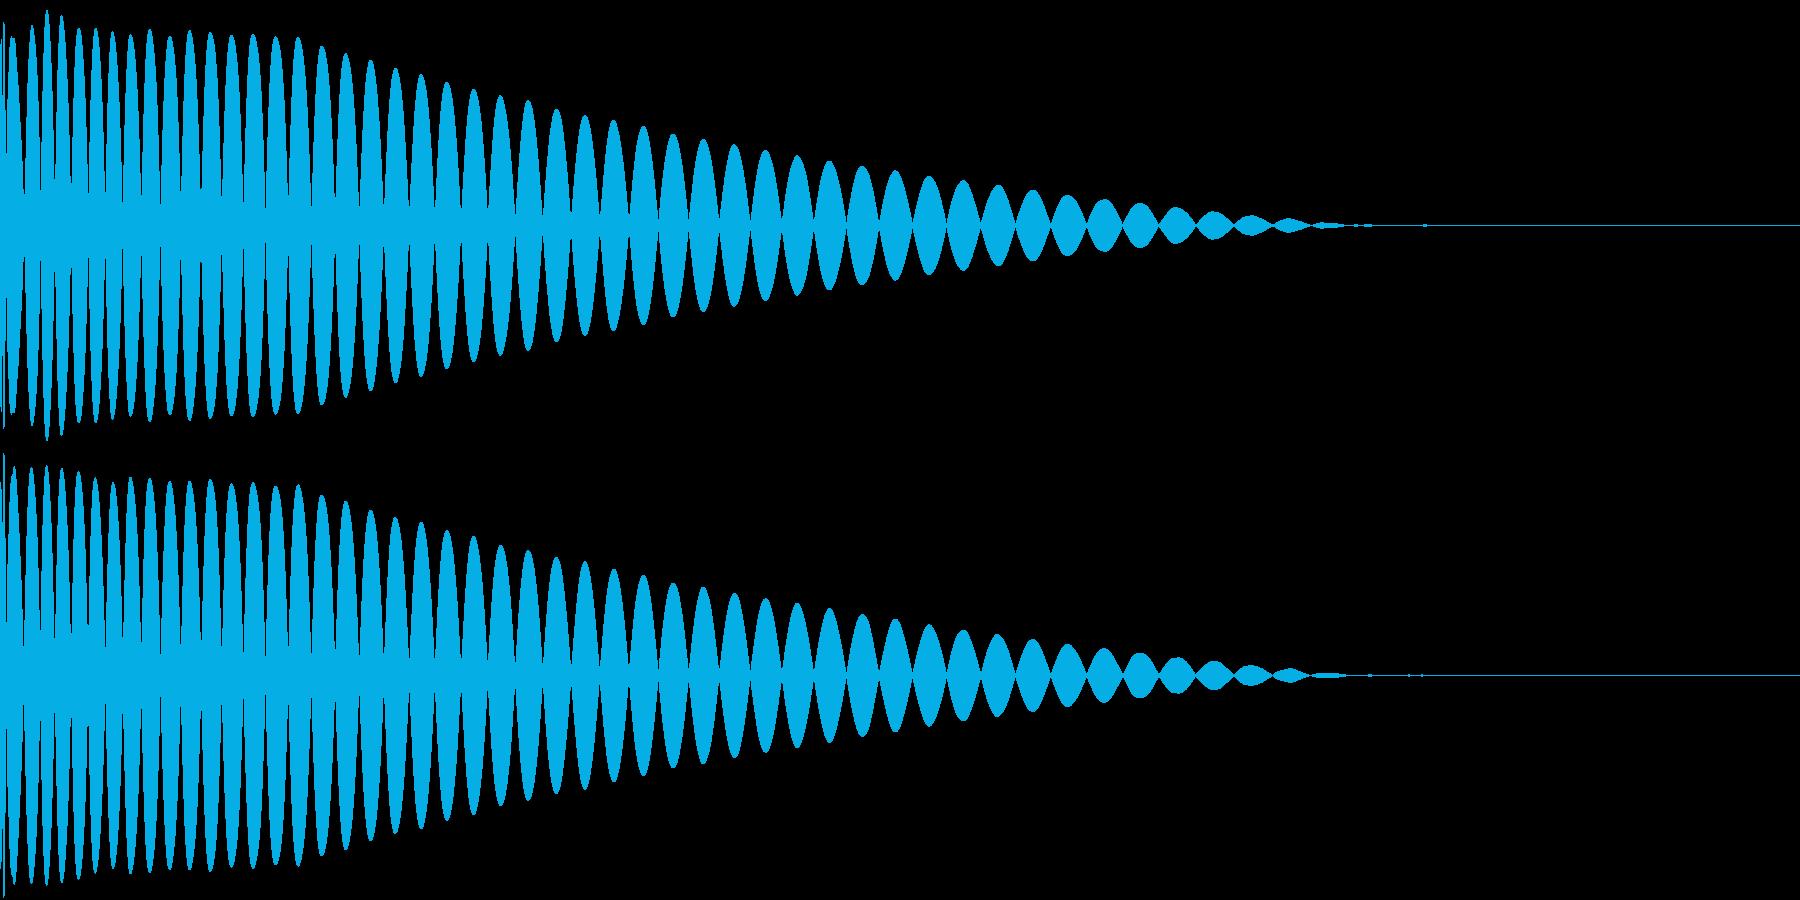 DTM Kick 8 オリジナル音源の再生済みの波形